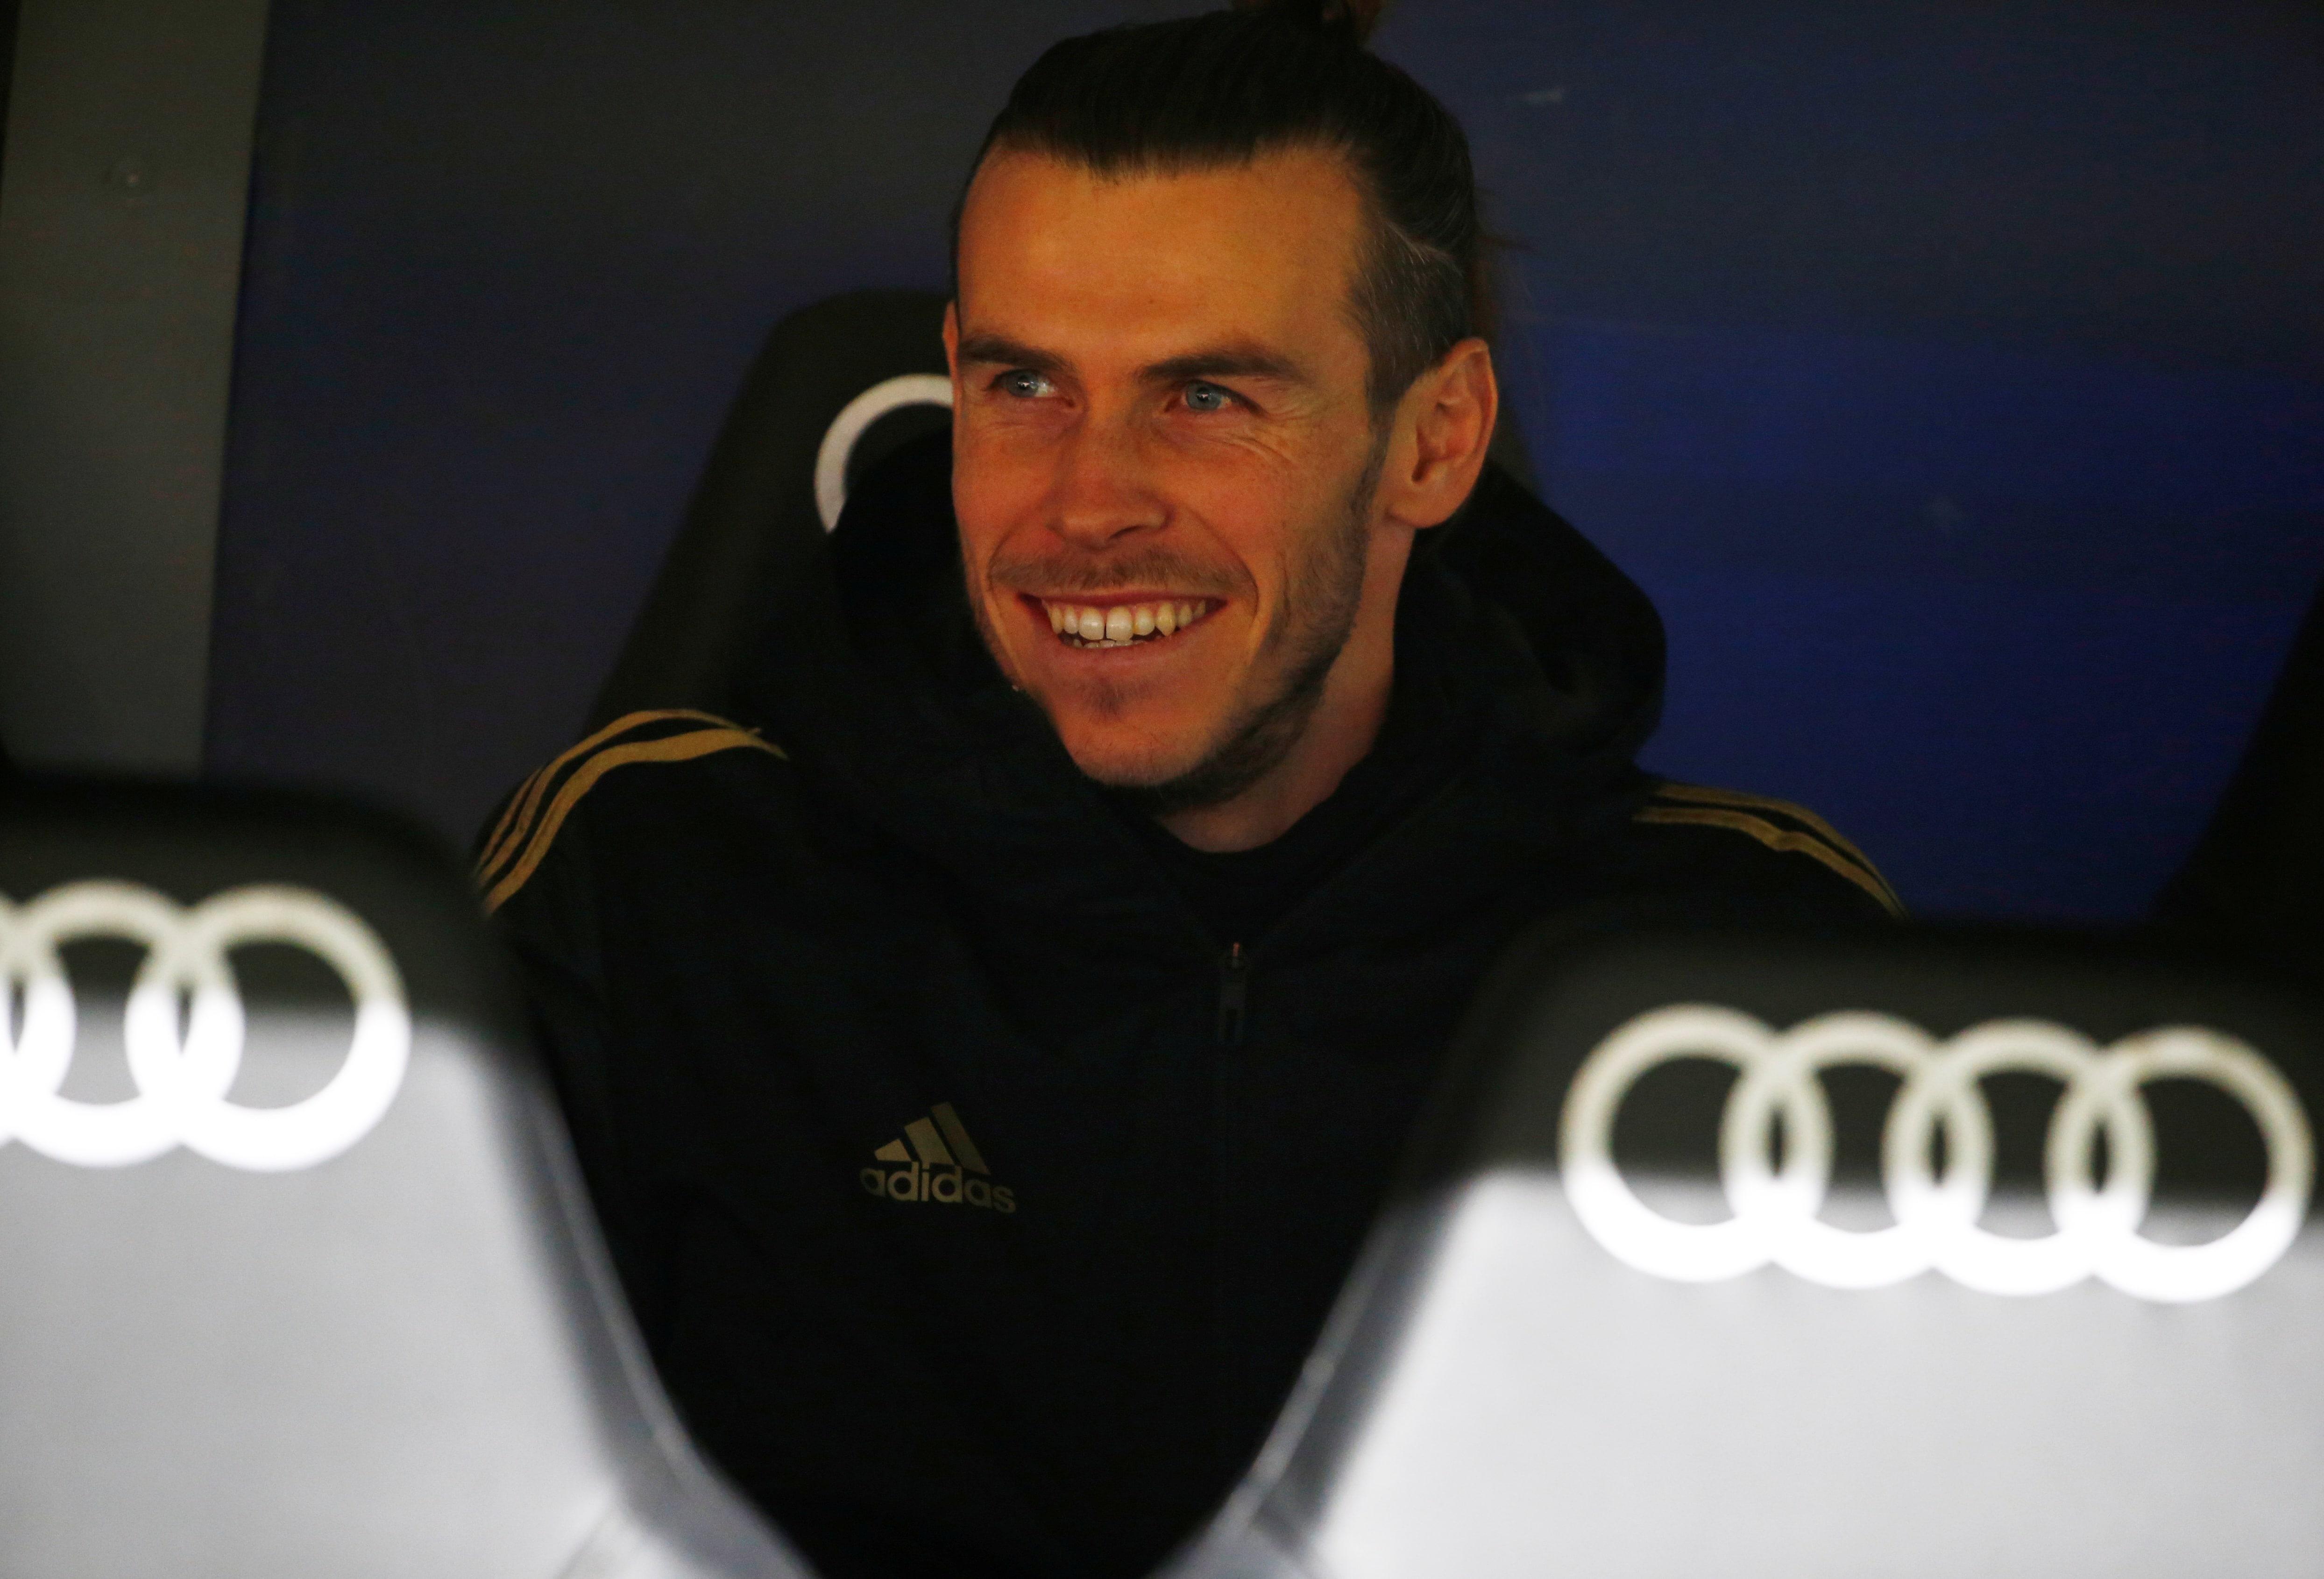 New Tottenham boss Jose Mourinho eyes Gareth Bale return